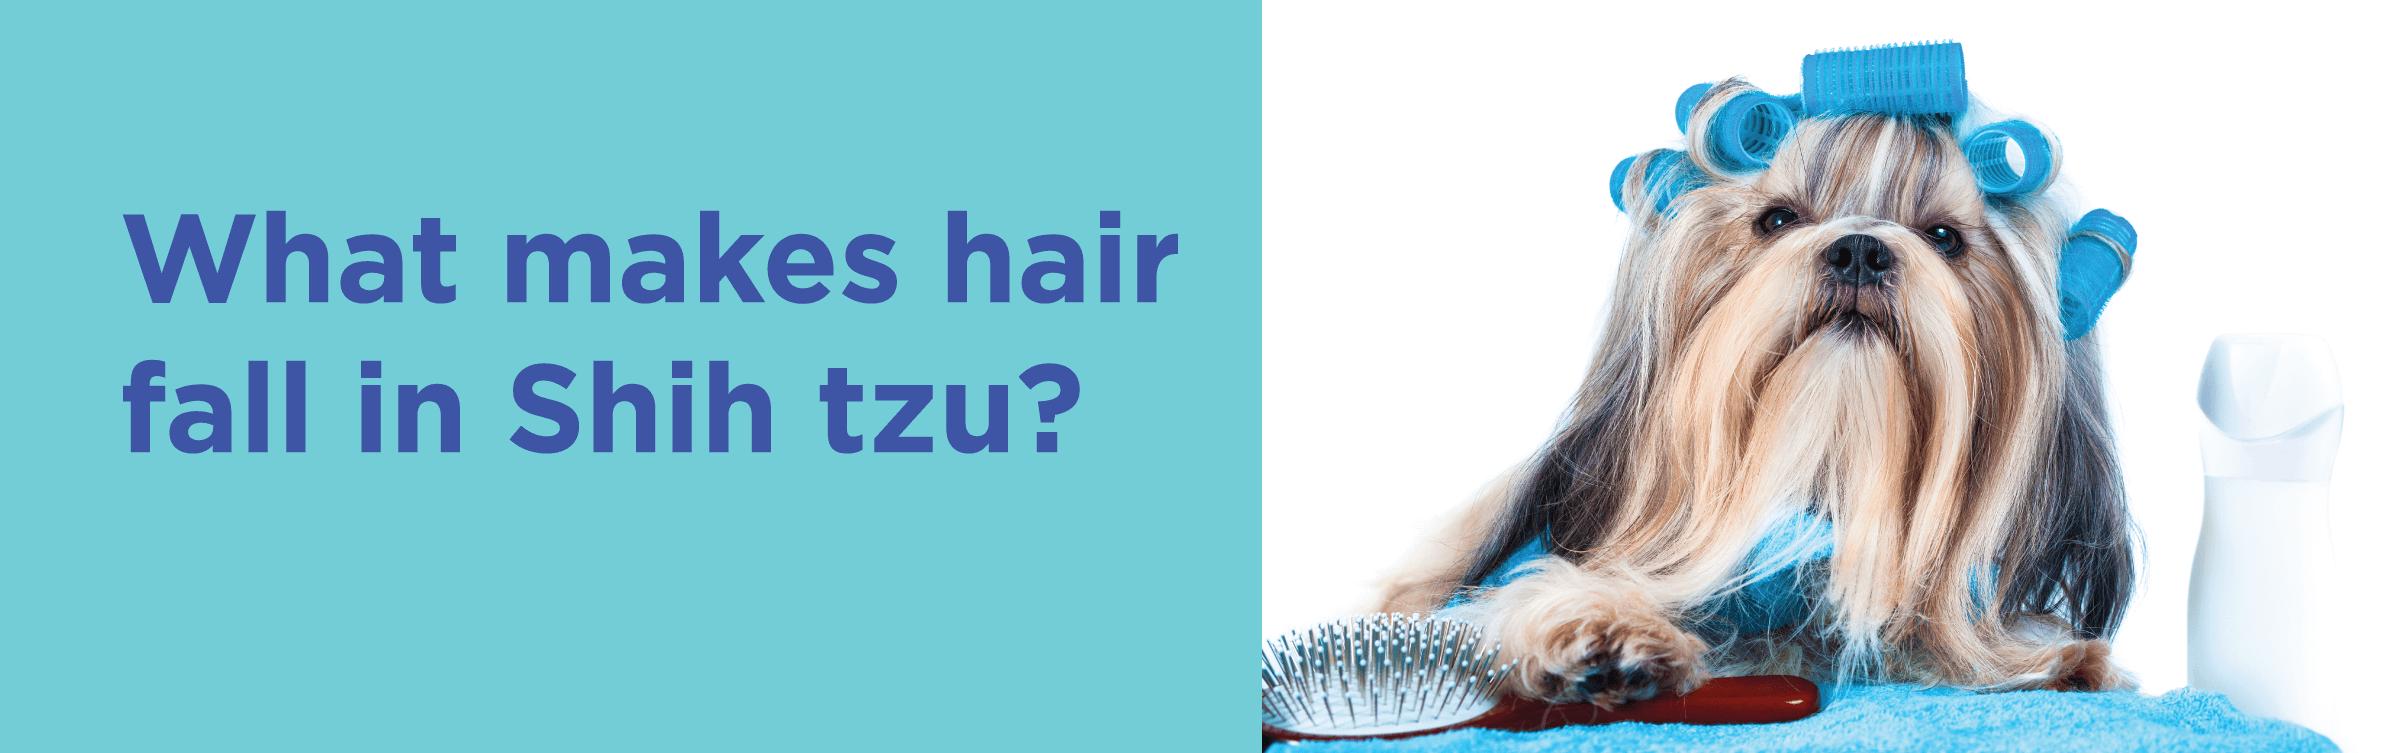 What makes hair fall in shih tzu